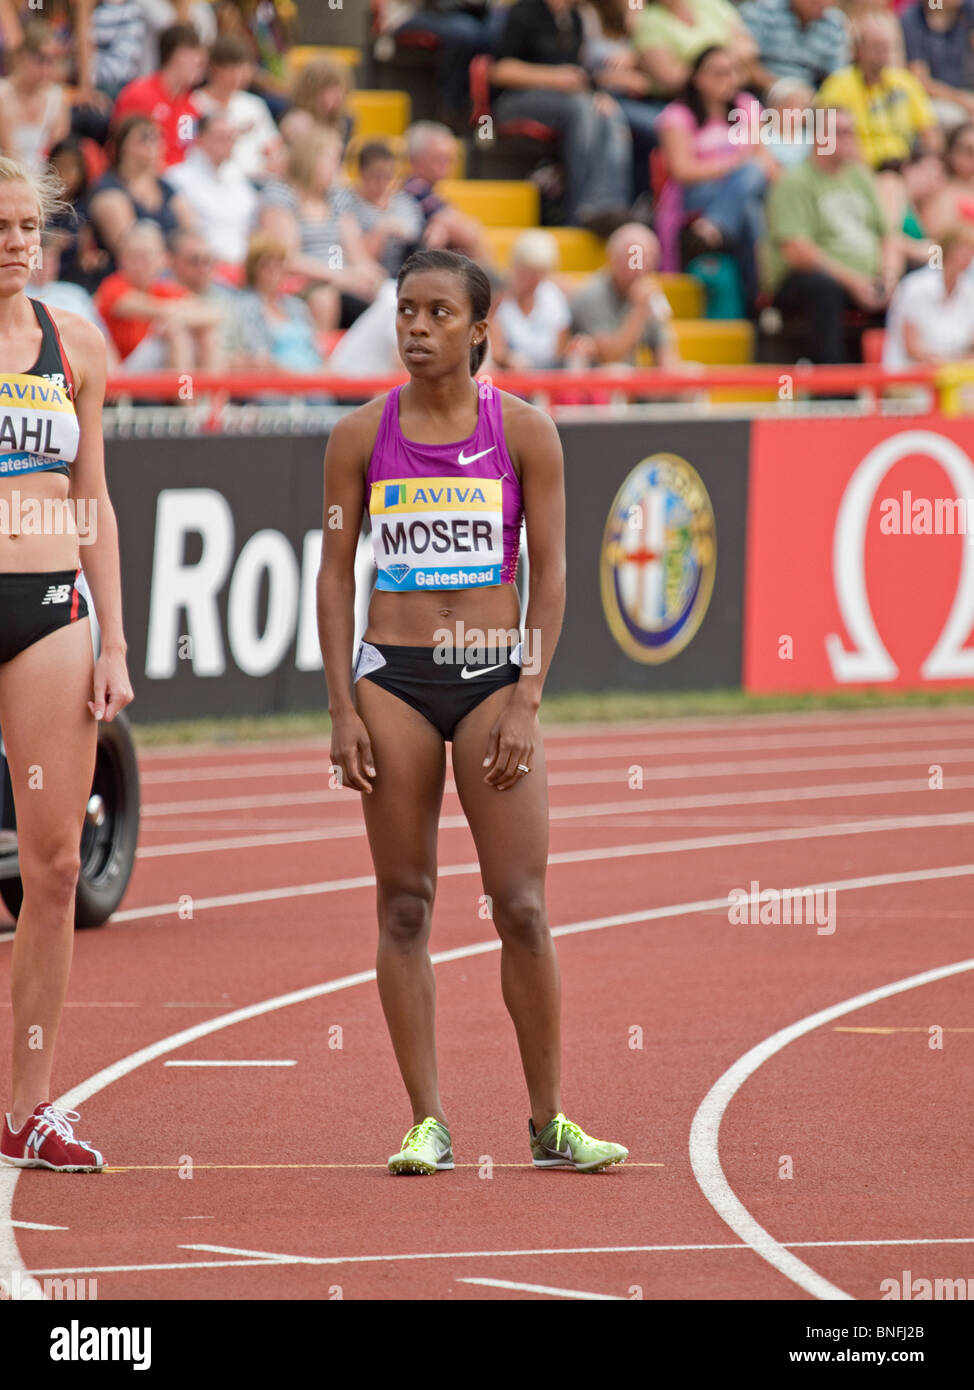 Treniere Moser preparing for womens 1500meters in IAAF Diamond League in Gateshead 2010 - Stock Image